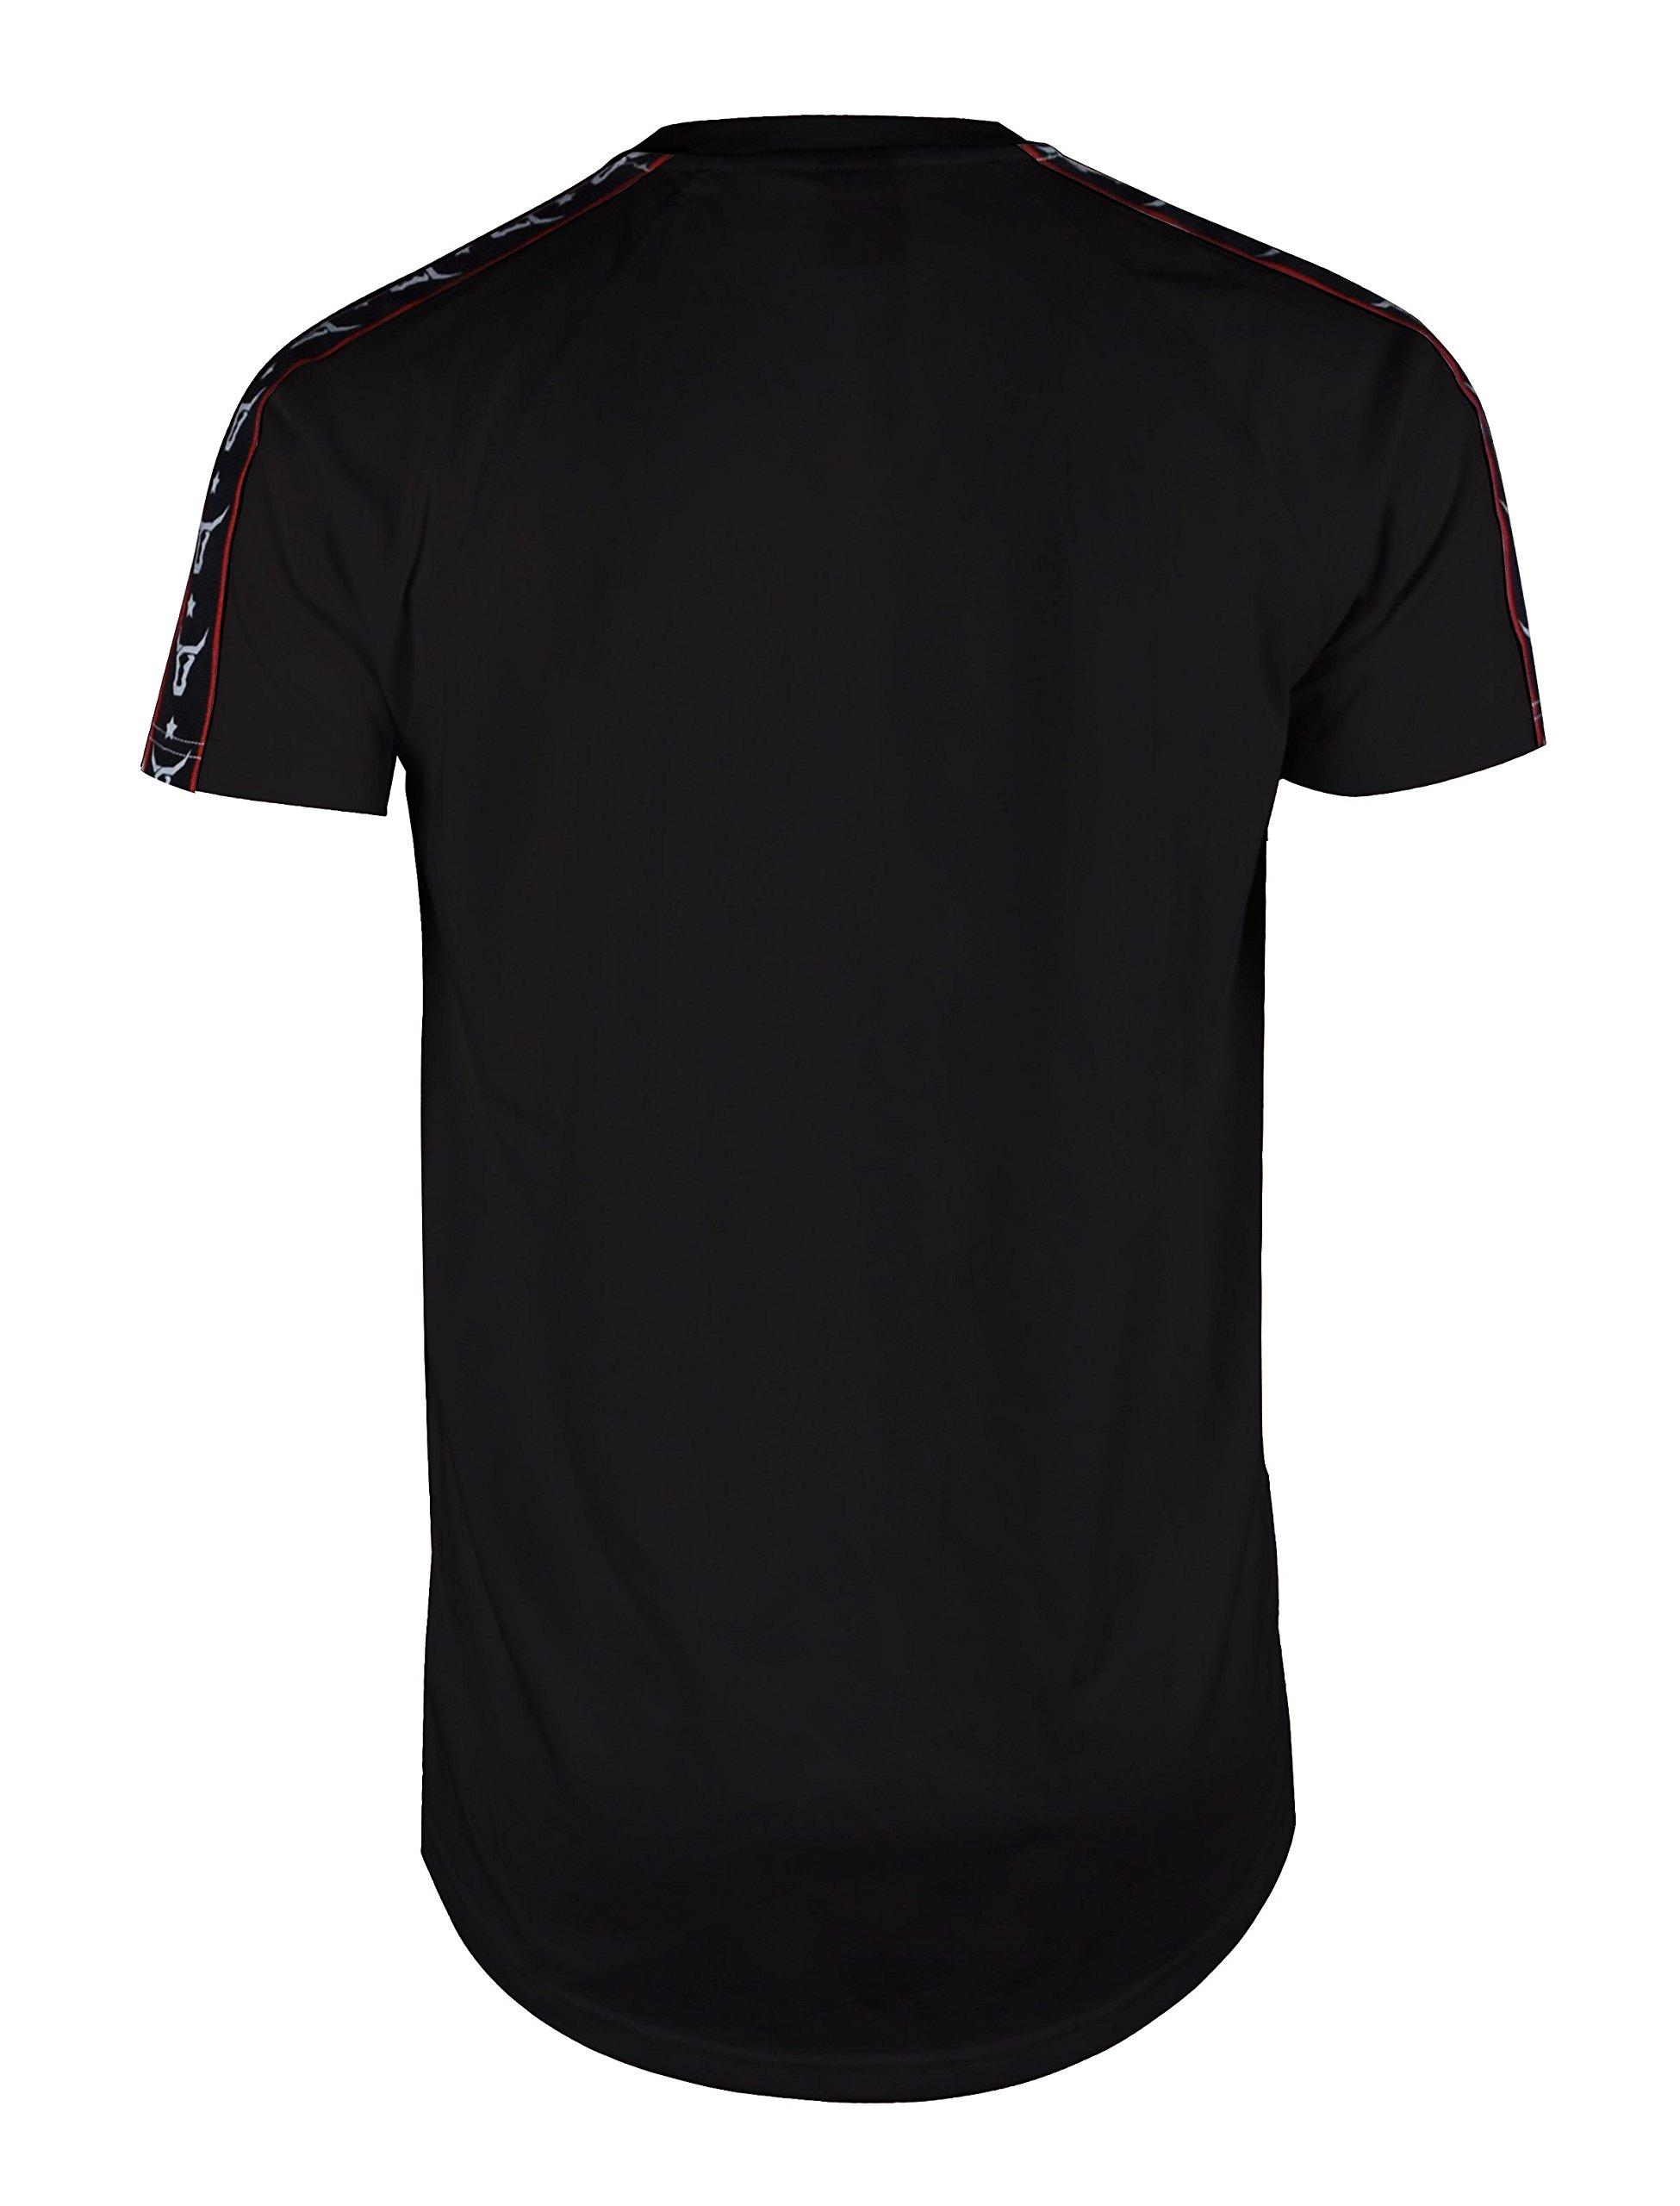 Screenshotbrand Mens Hipster Hip-Hop Premium Tees – Stylish Fashion T-Shirt